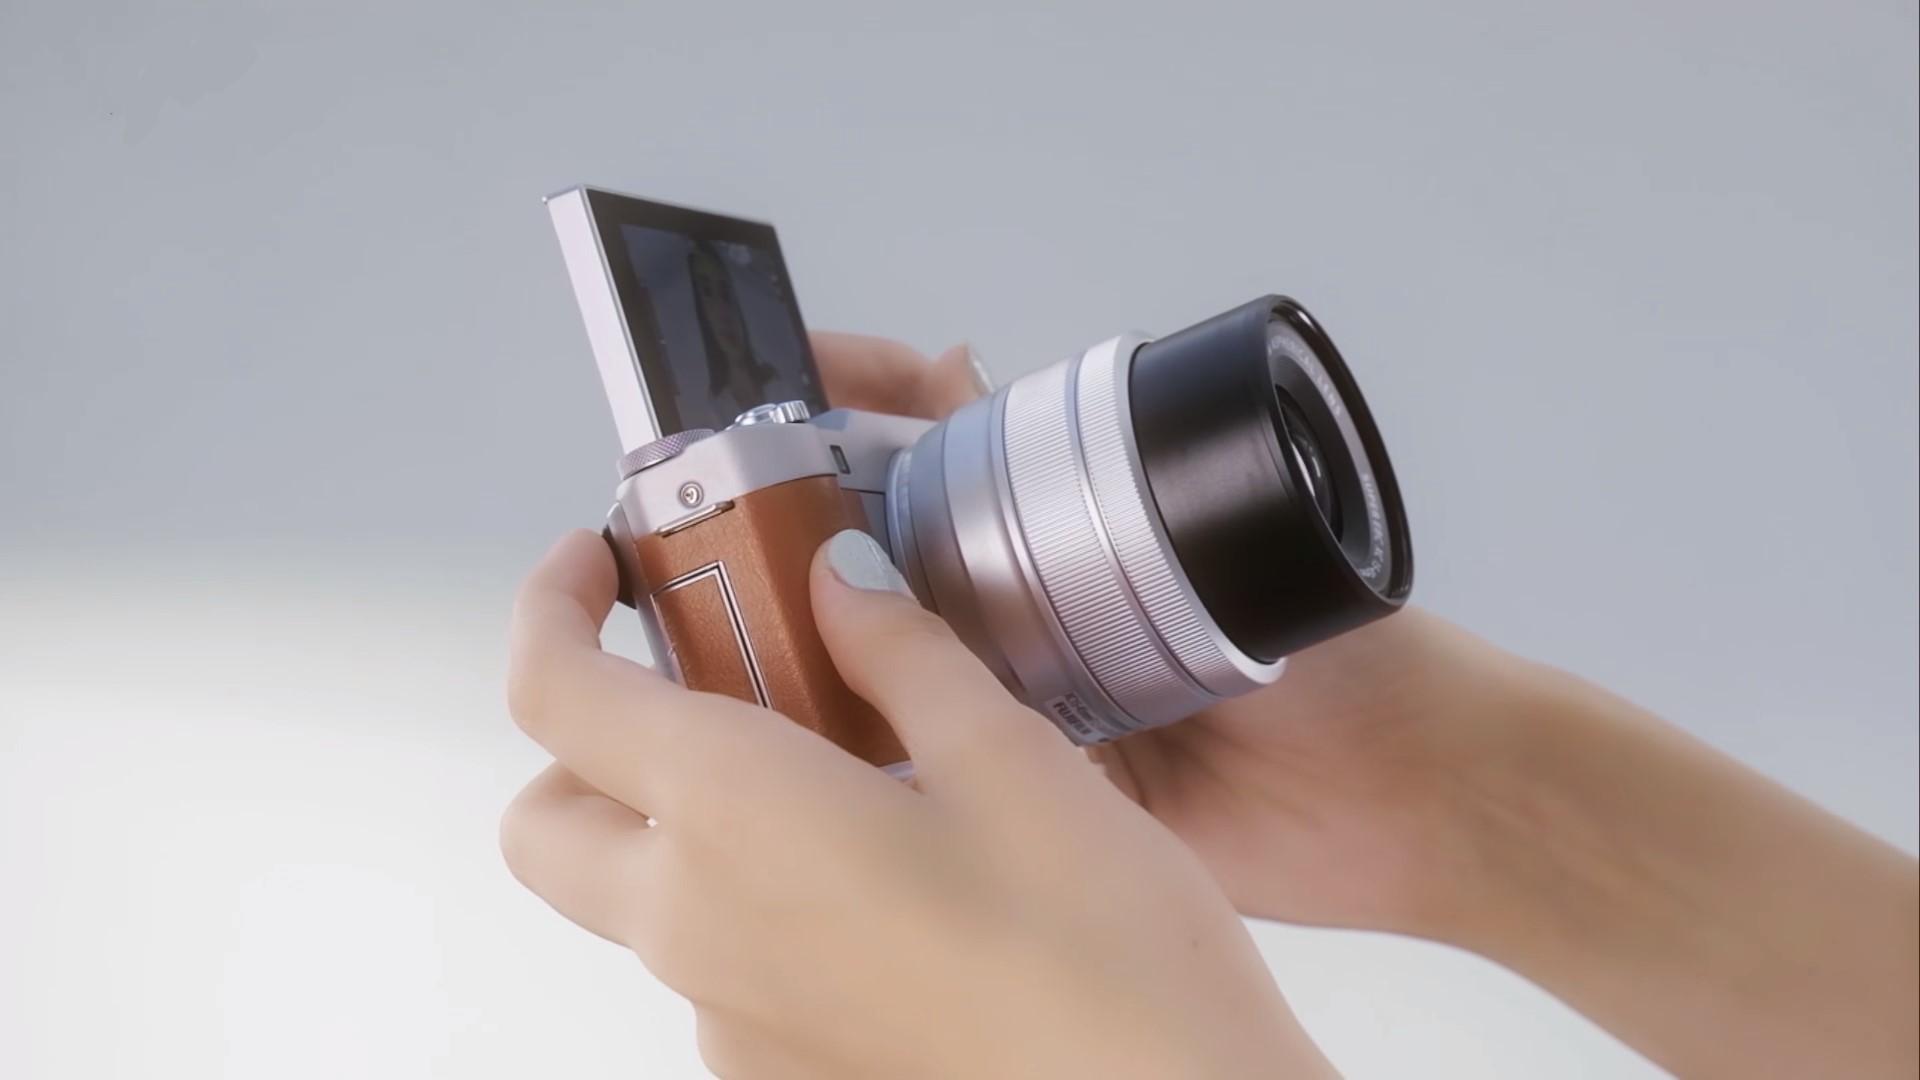 Fujifilm анонсировала беззеркальную компактную камеру X-A5